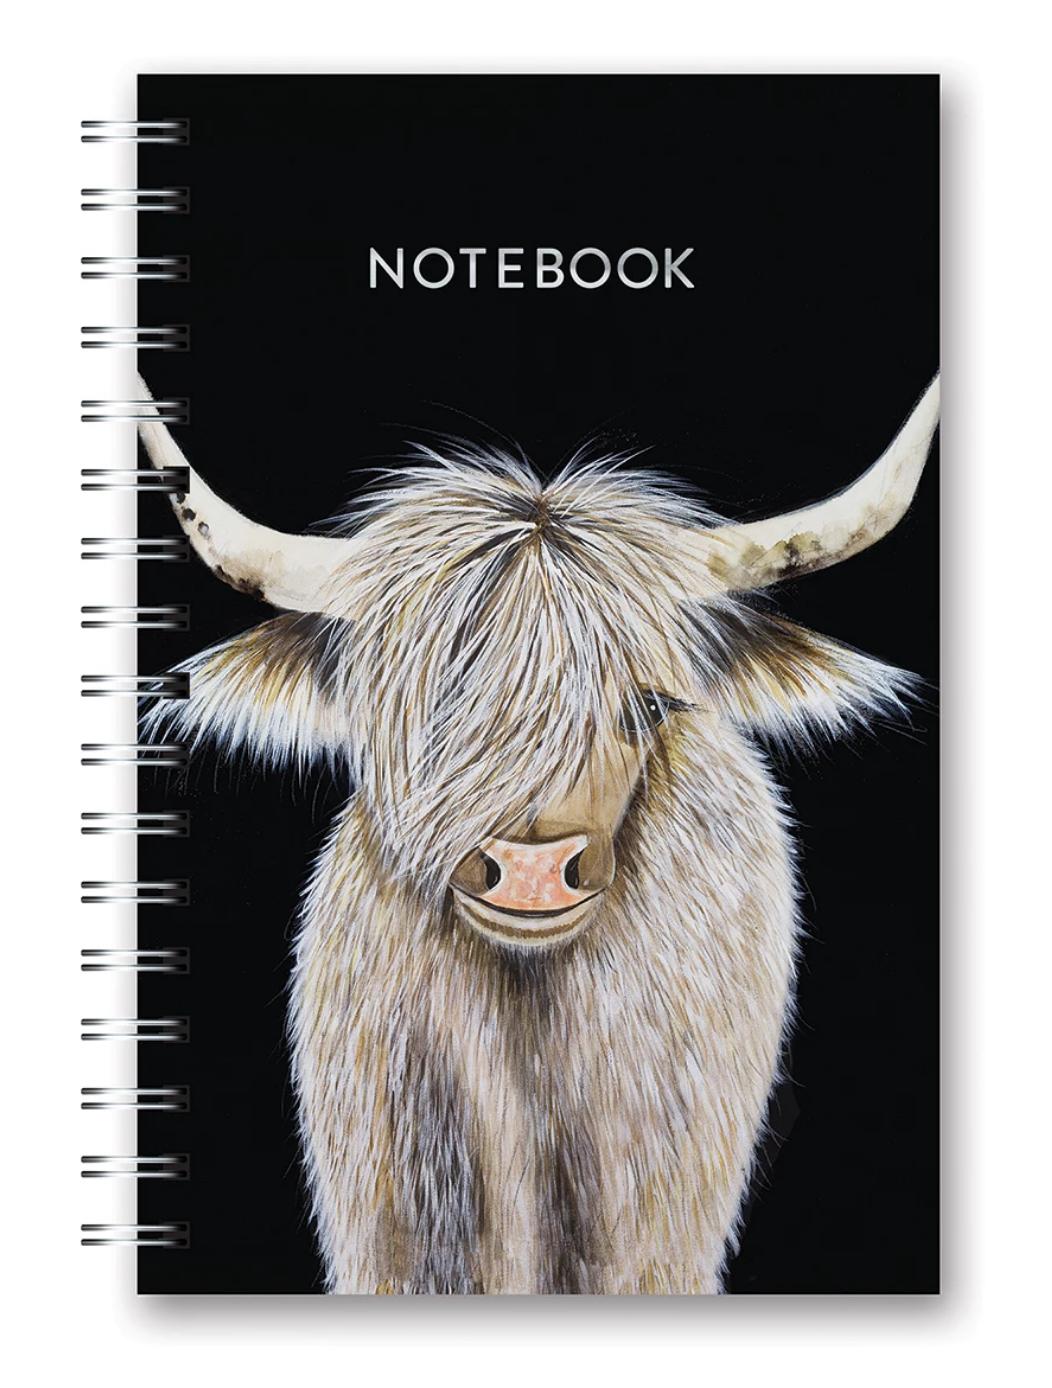 Studio Oh Spiral Notebook Medium - Beau